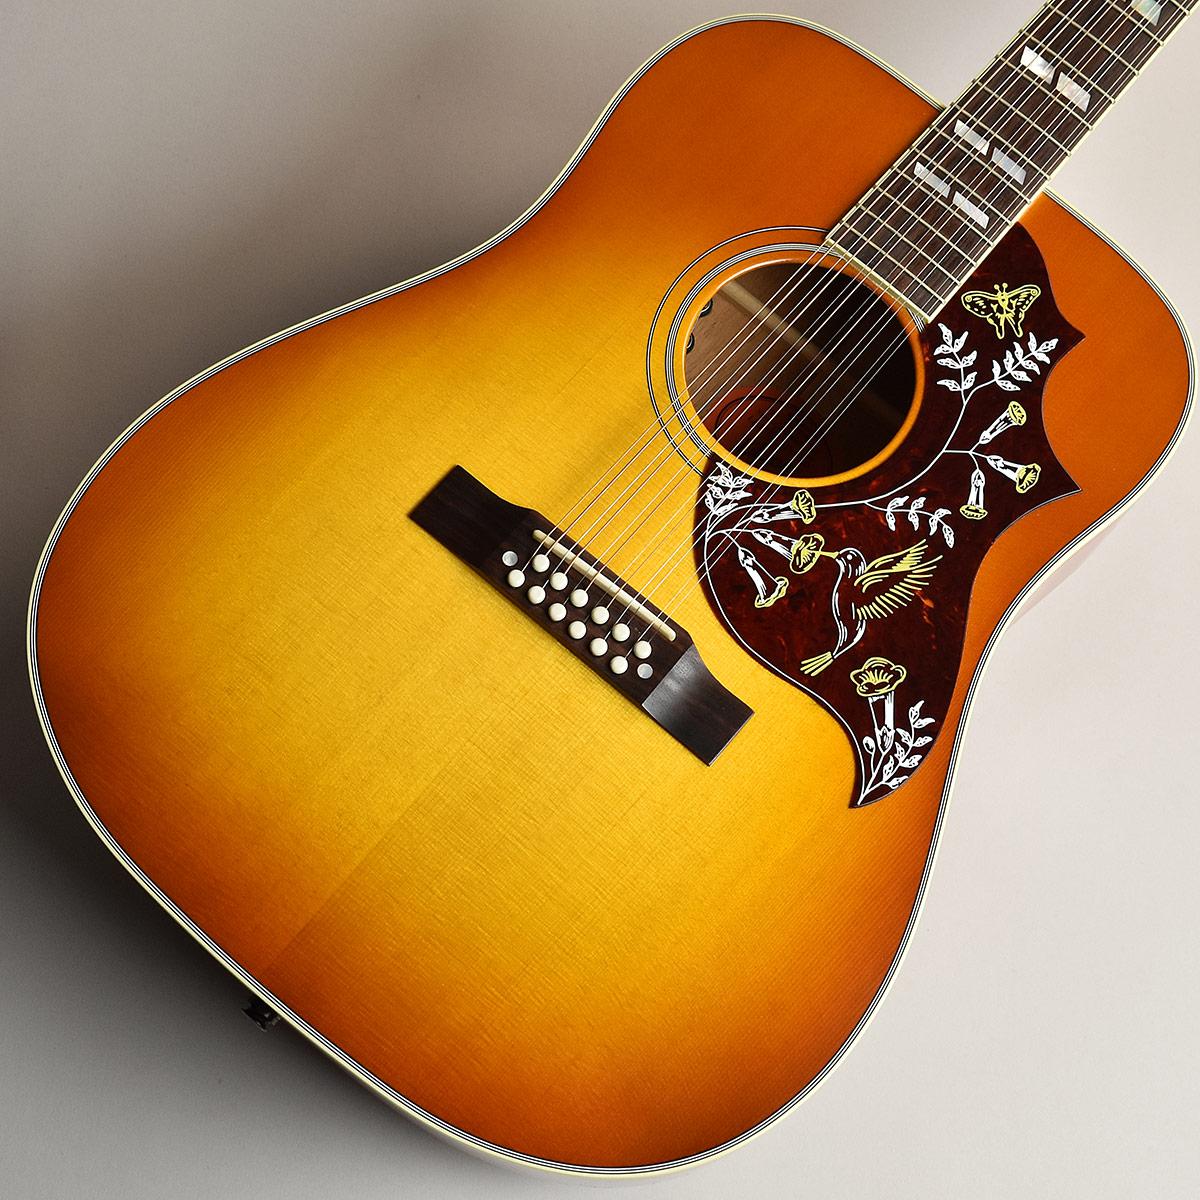 Gibson Hummingbird 12String 2017 Limited Heritage Cherry Sunburst S/N:107065 【ギブソン ハミングバード 12弦】【未展示品】